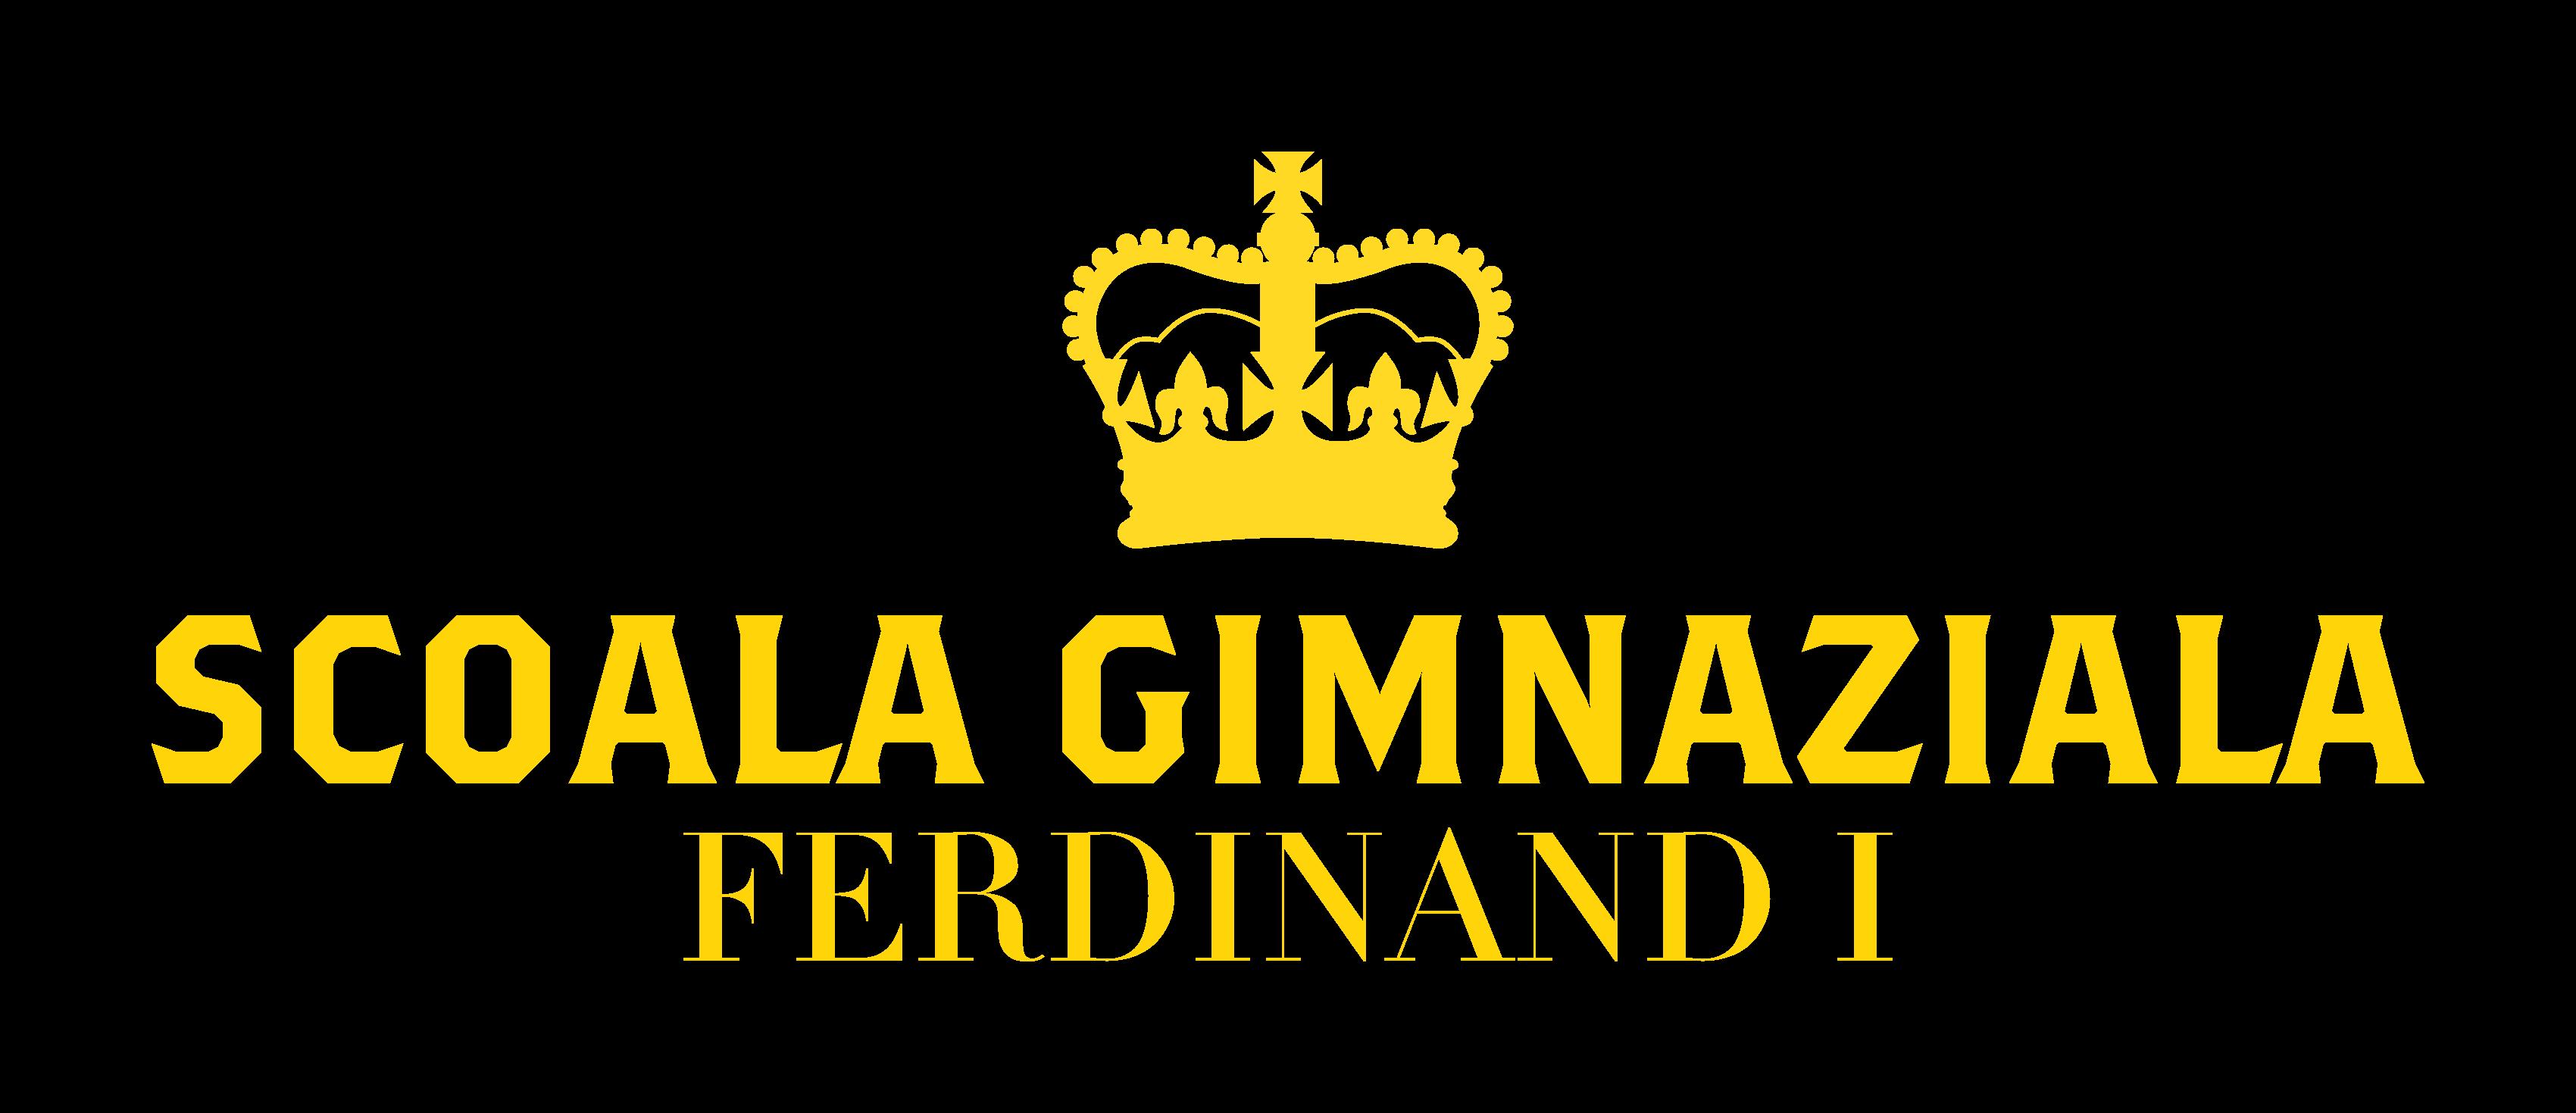 Ferdinand ingles